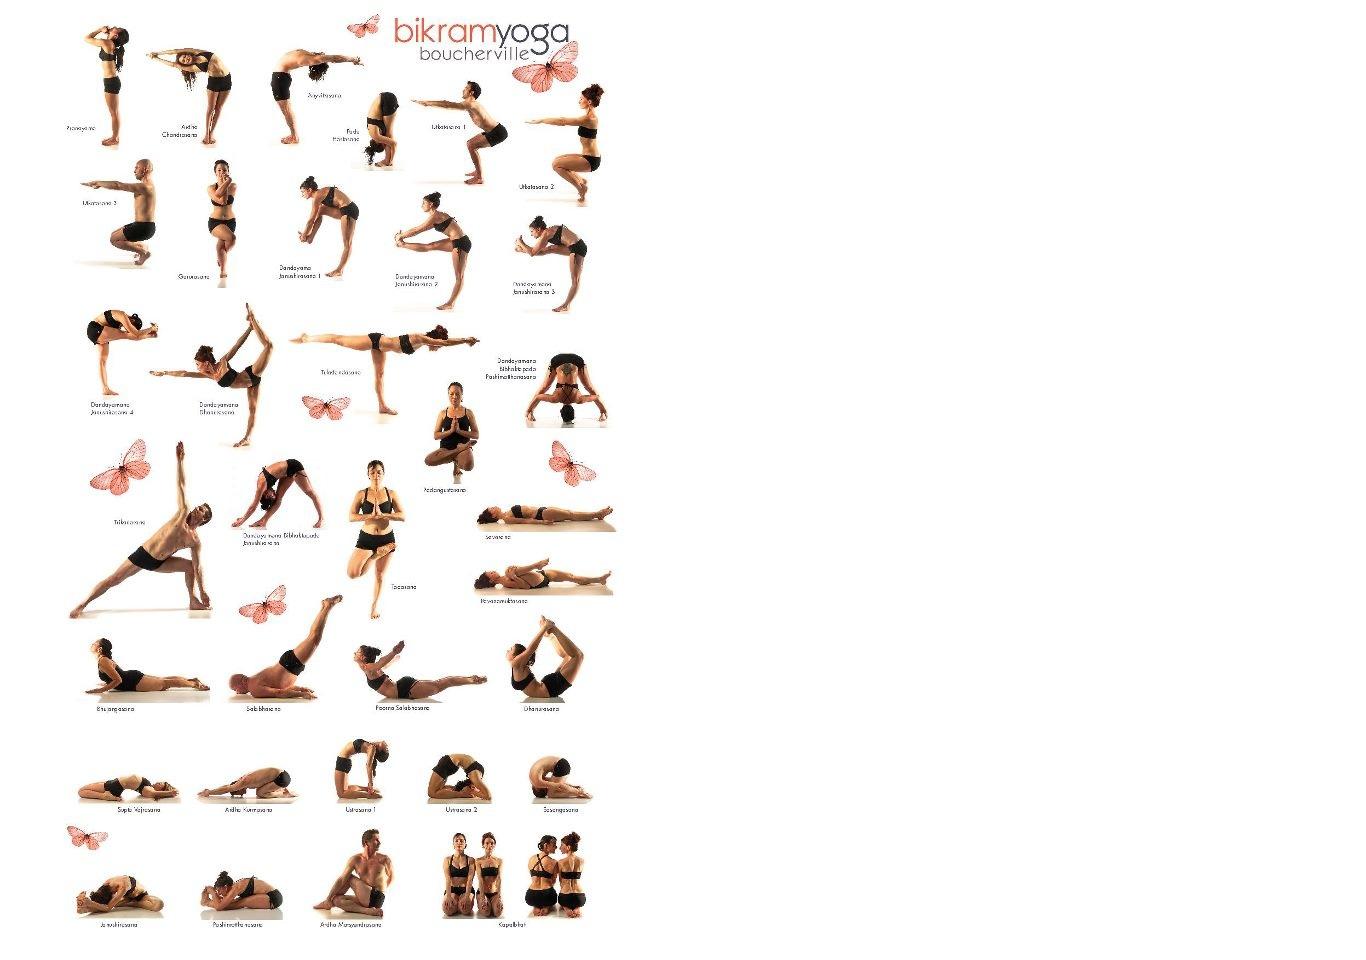 image regarding Bikram Yoga Poses Chart Printable titled Very hot Yoga Pose Chart